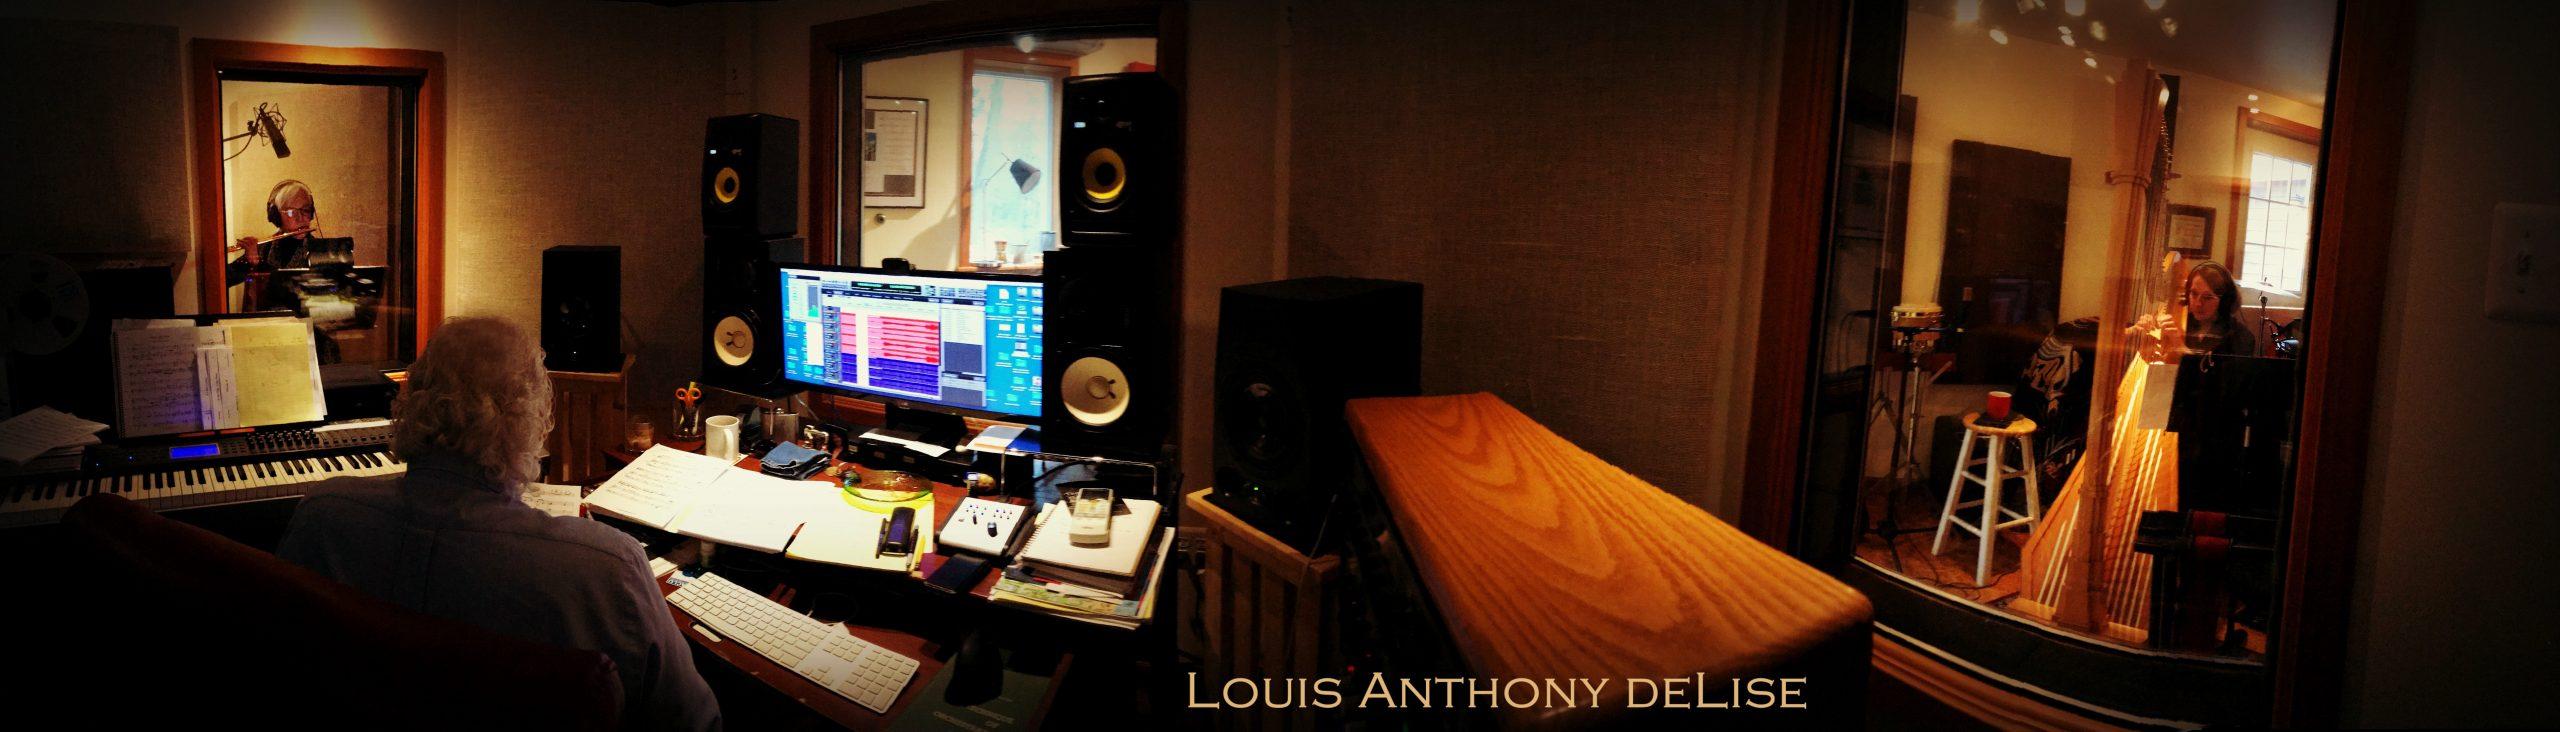 Louis Anthony deLise, DMA